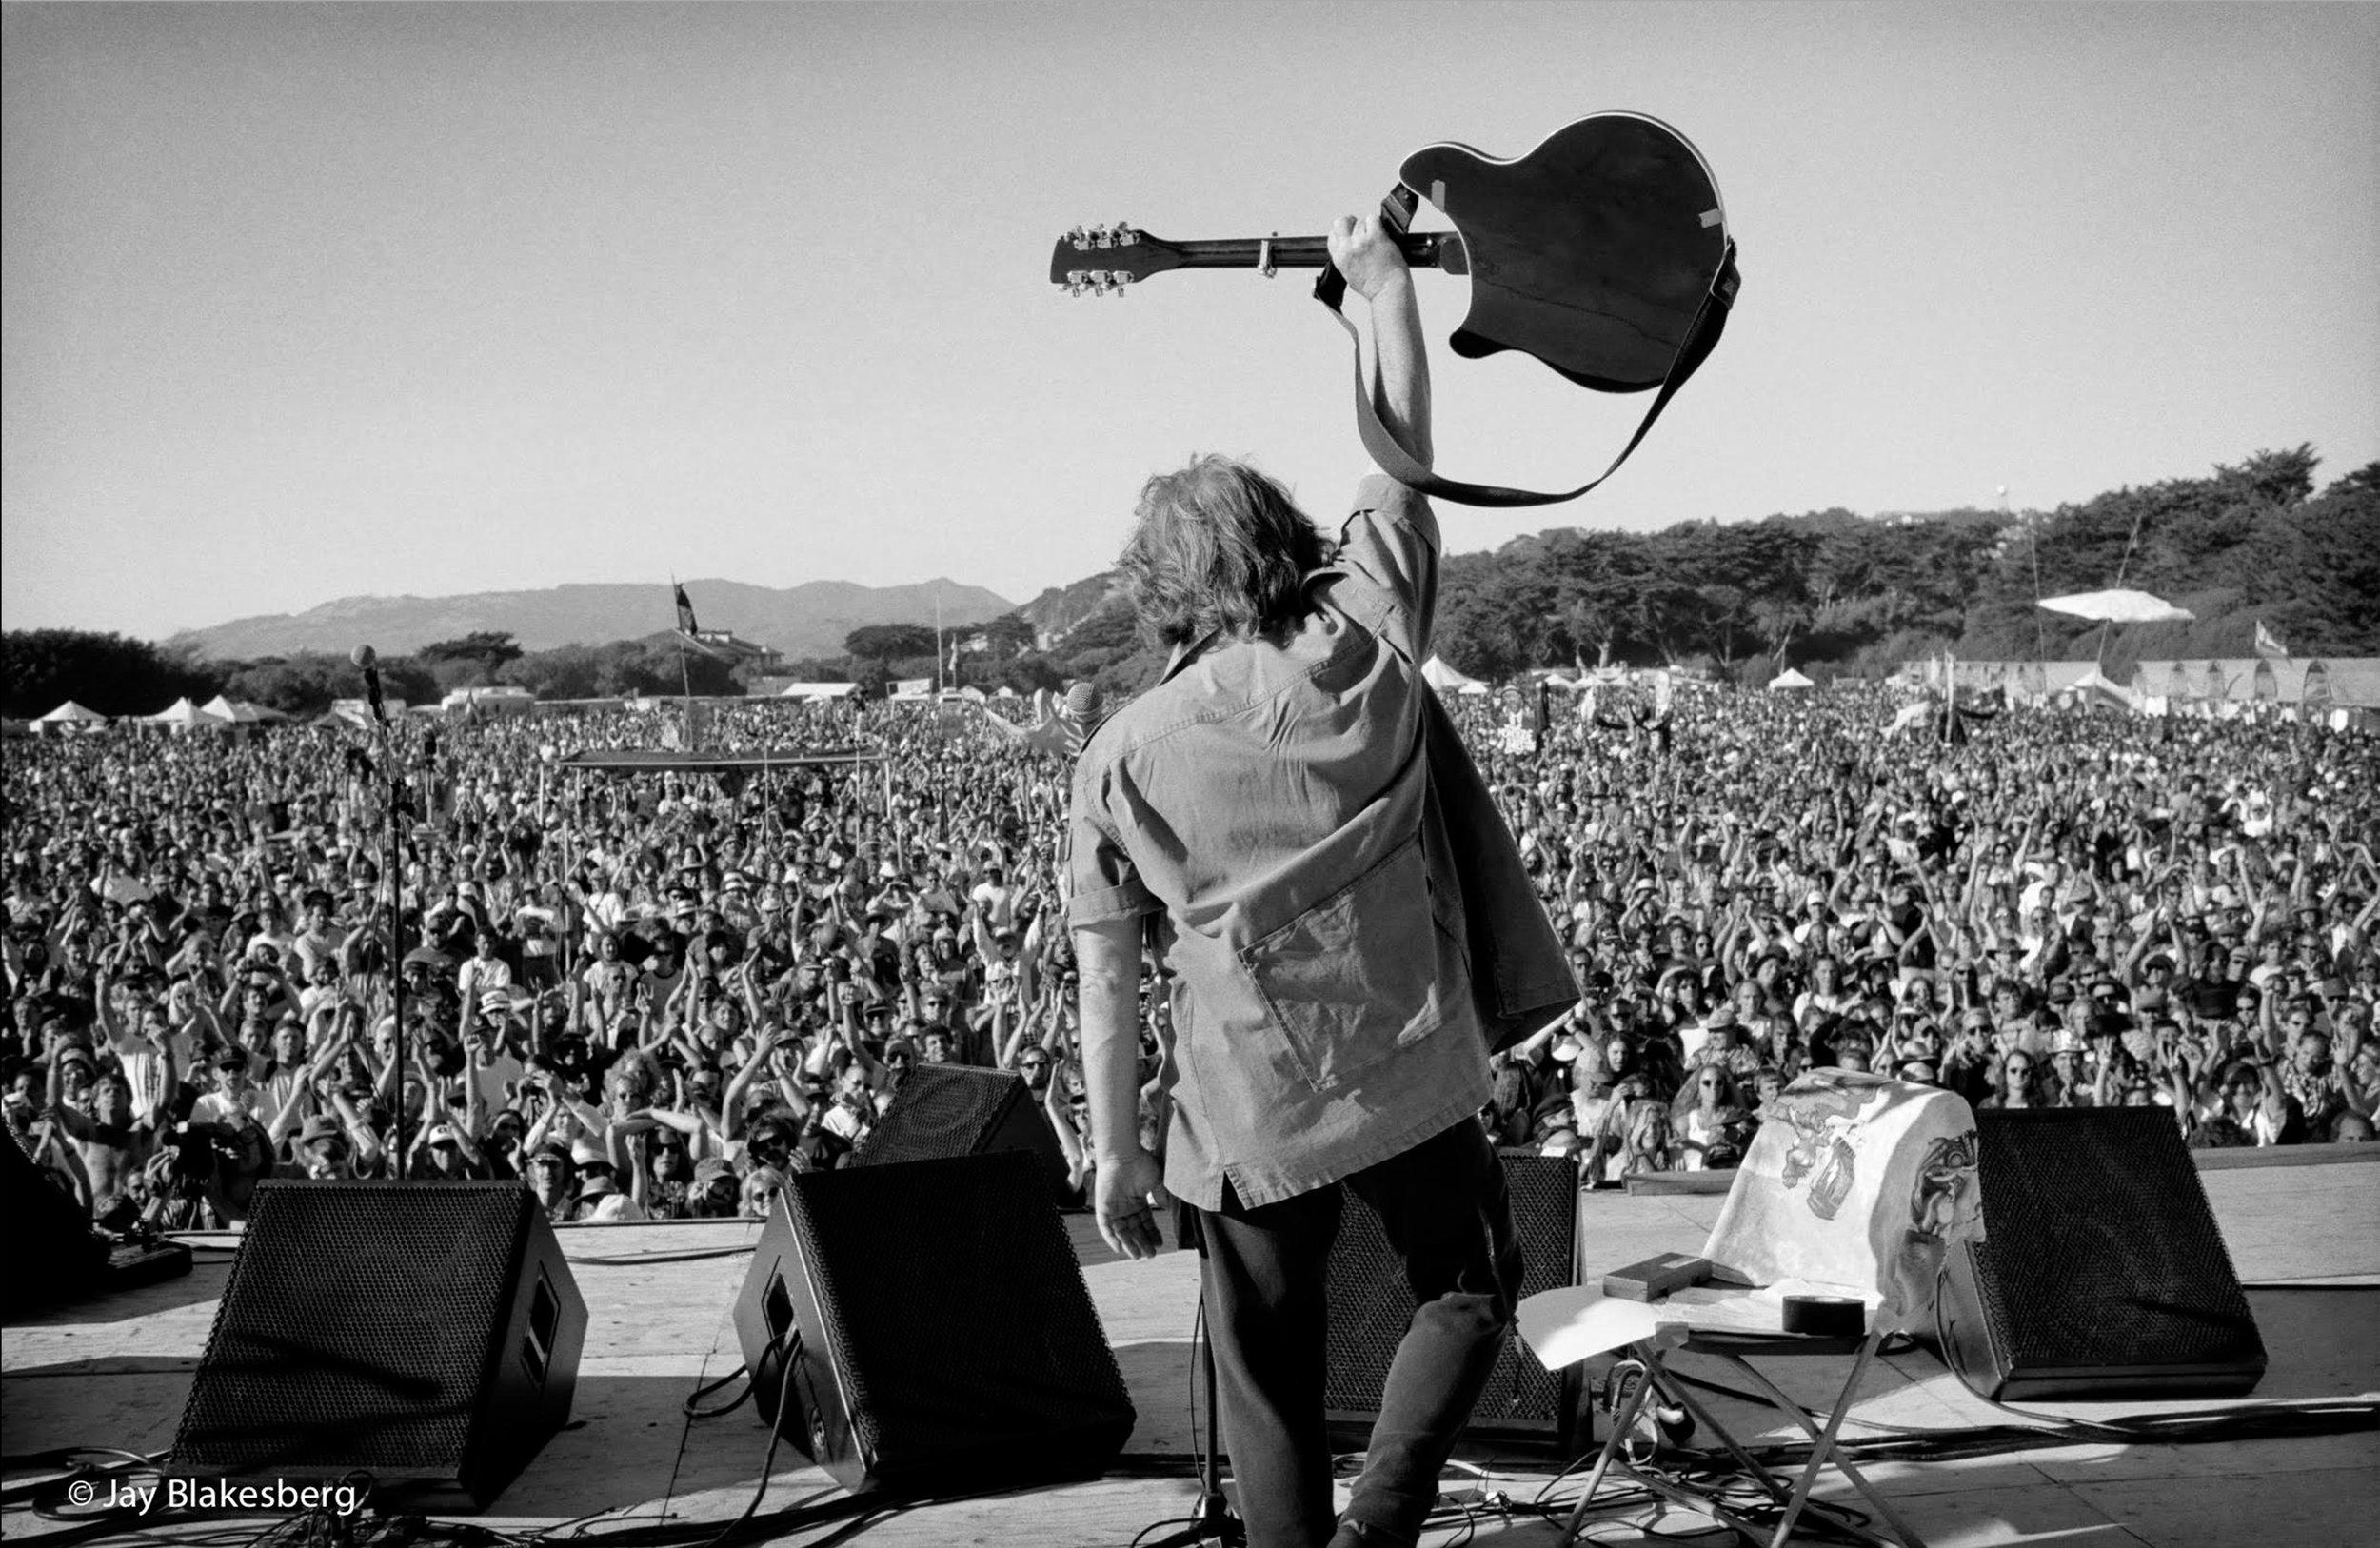 raising-guitar-by-JAY-BLAKESBERG.jpg